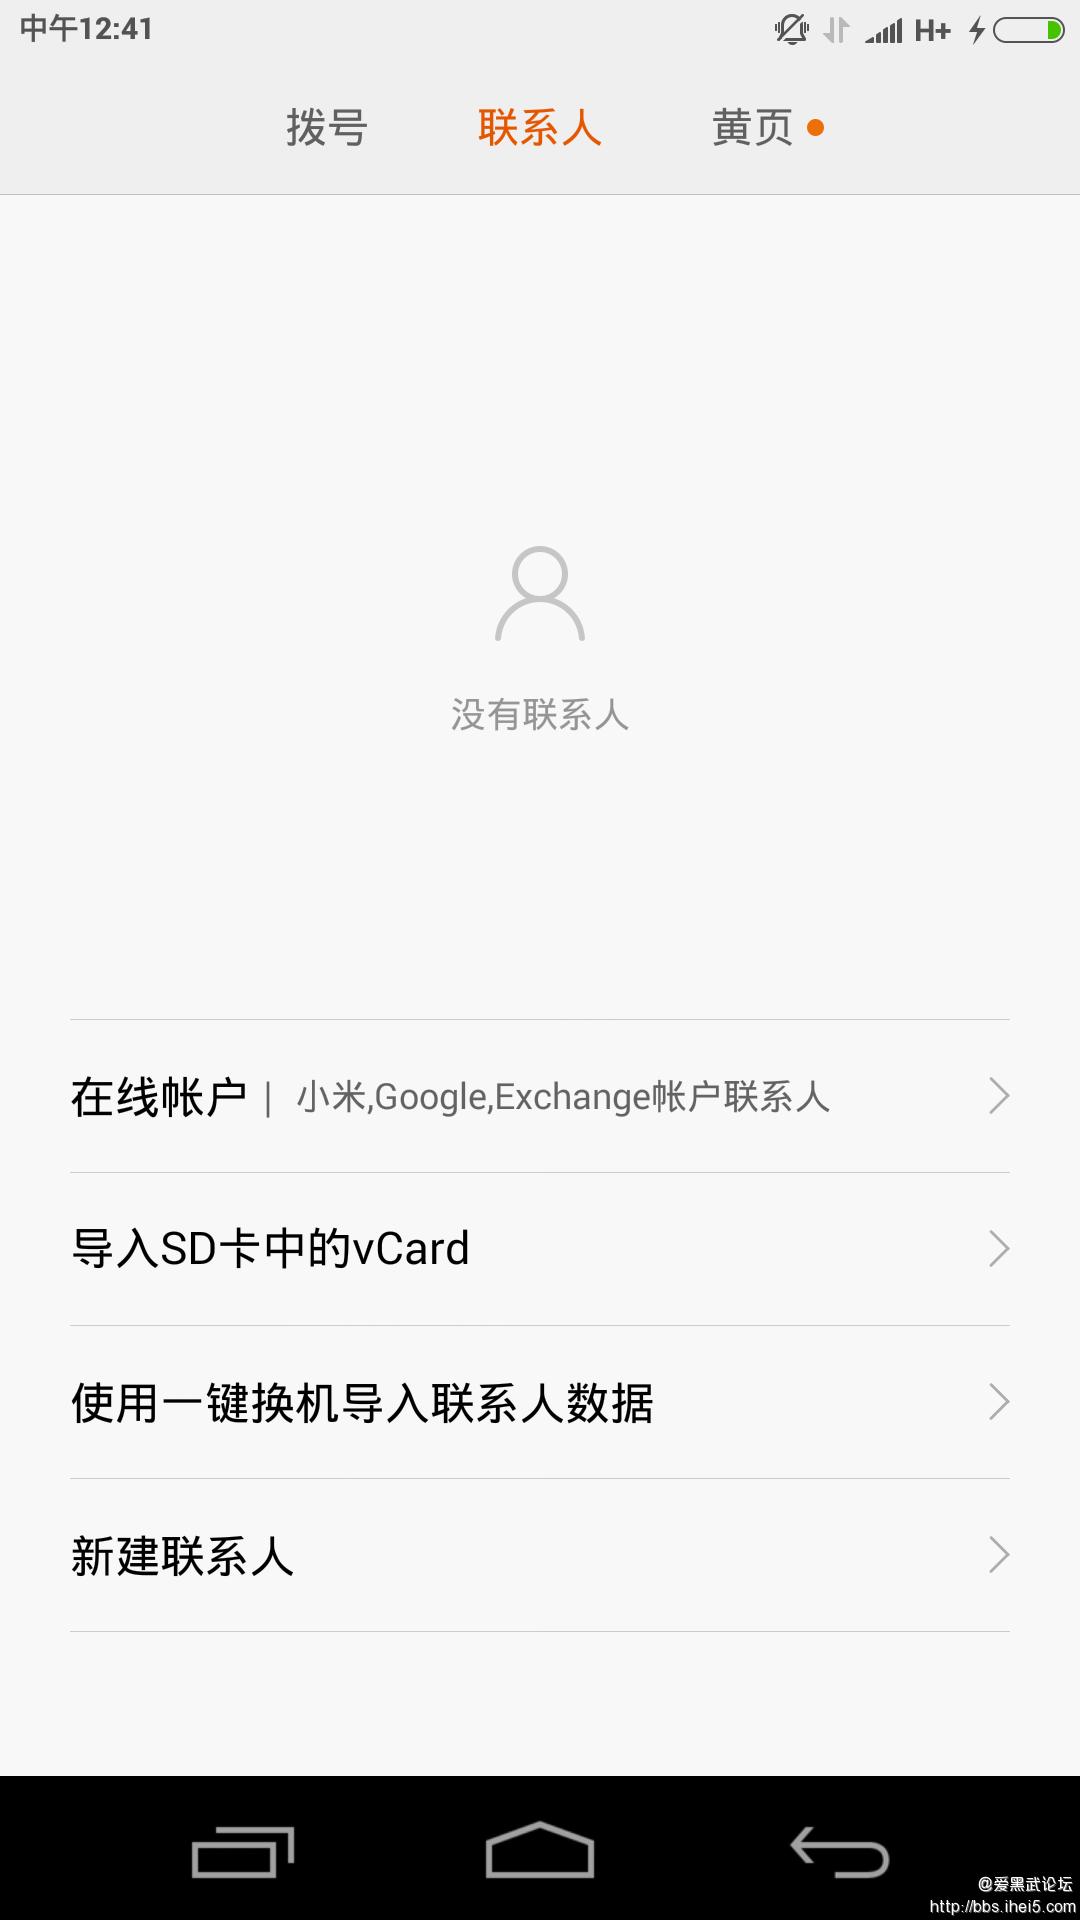 Screenshot_2016-02-02-12-41-42_com.android.contacts.png